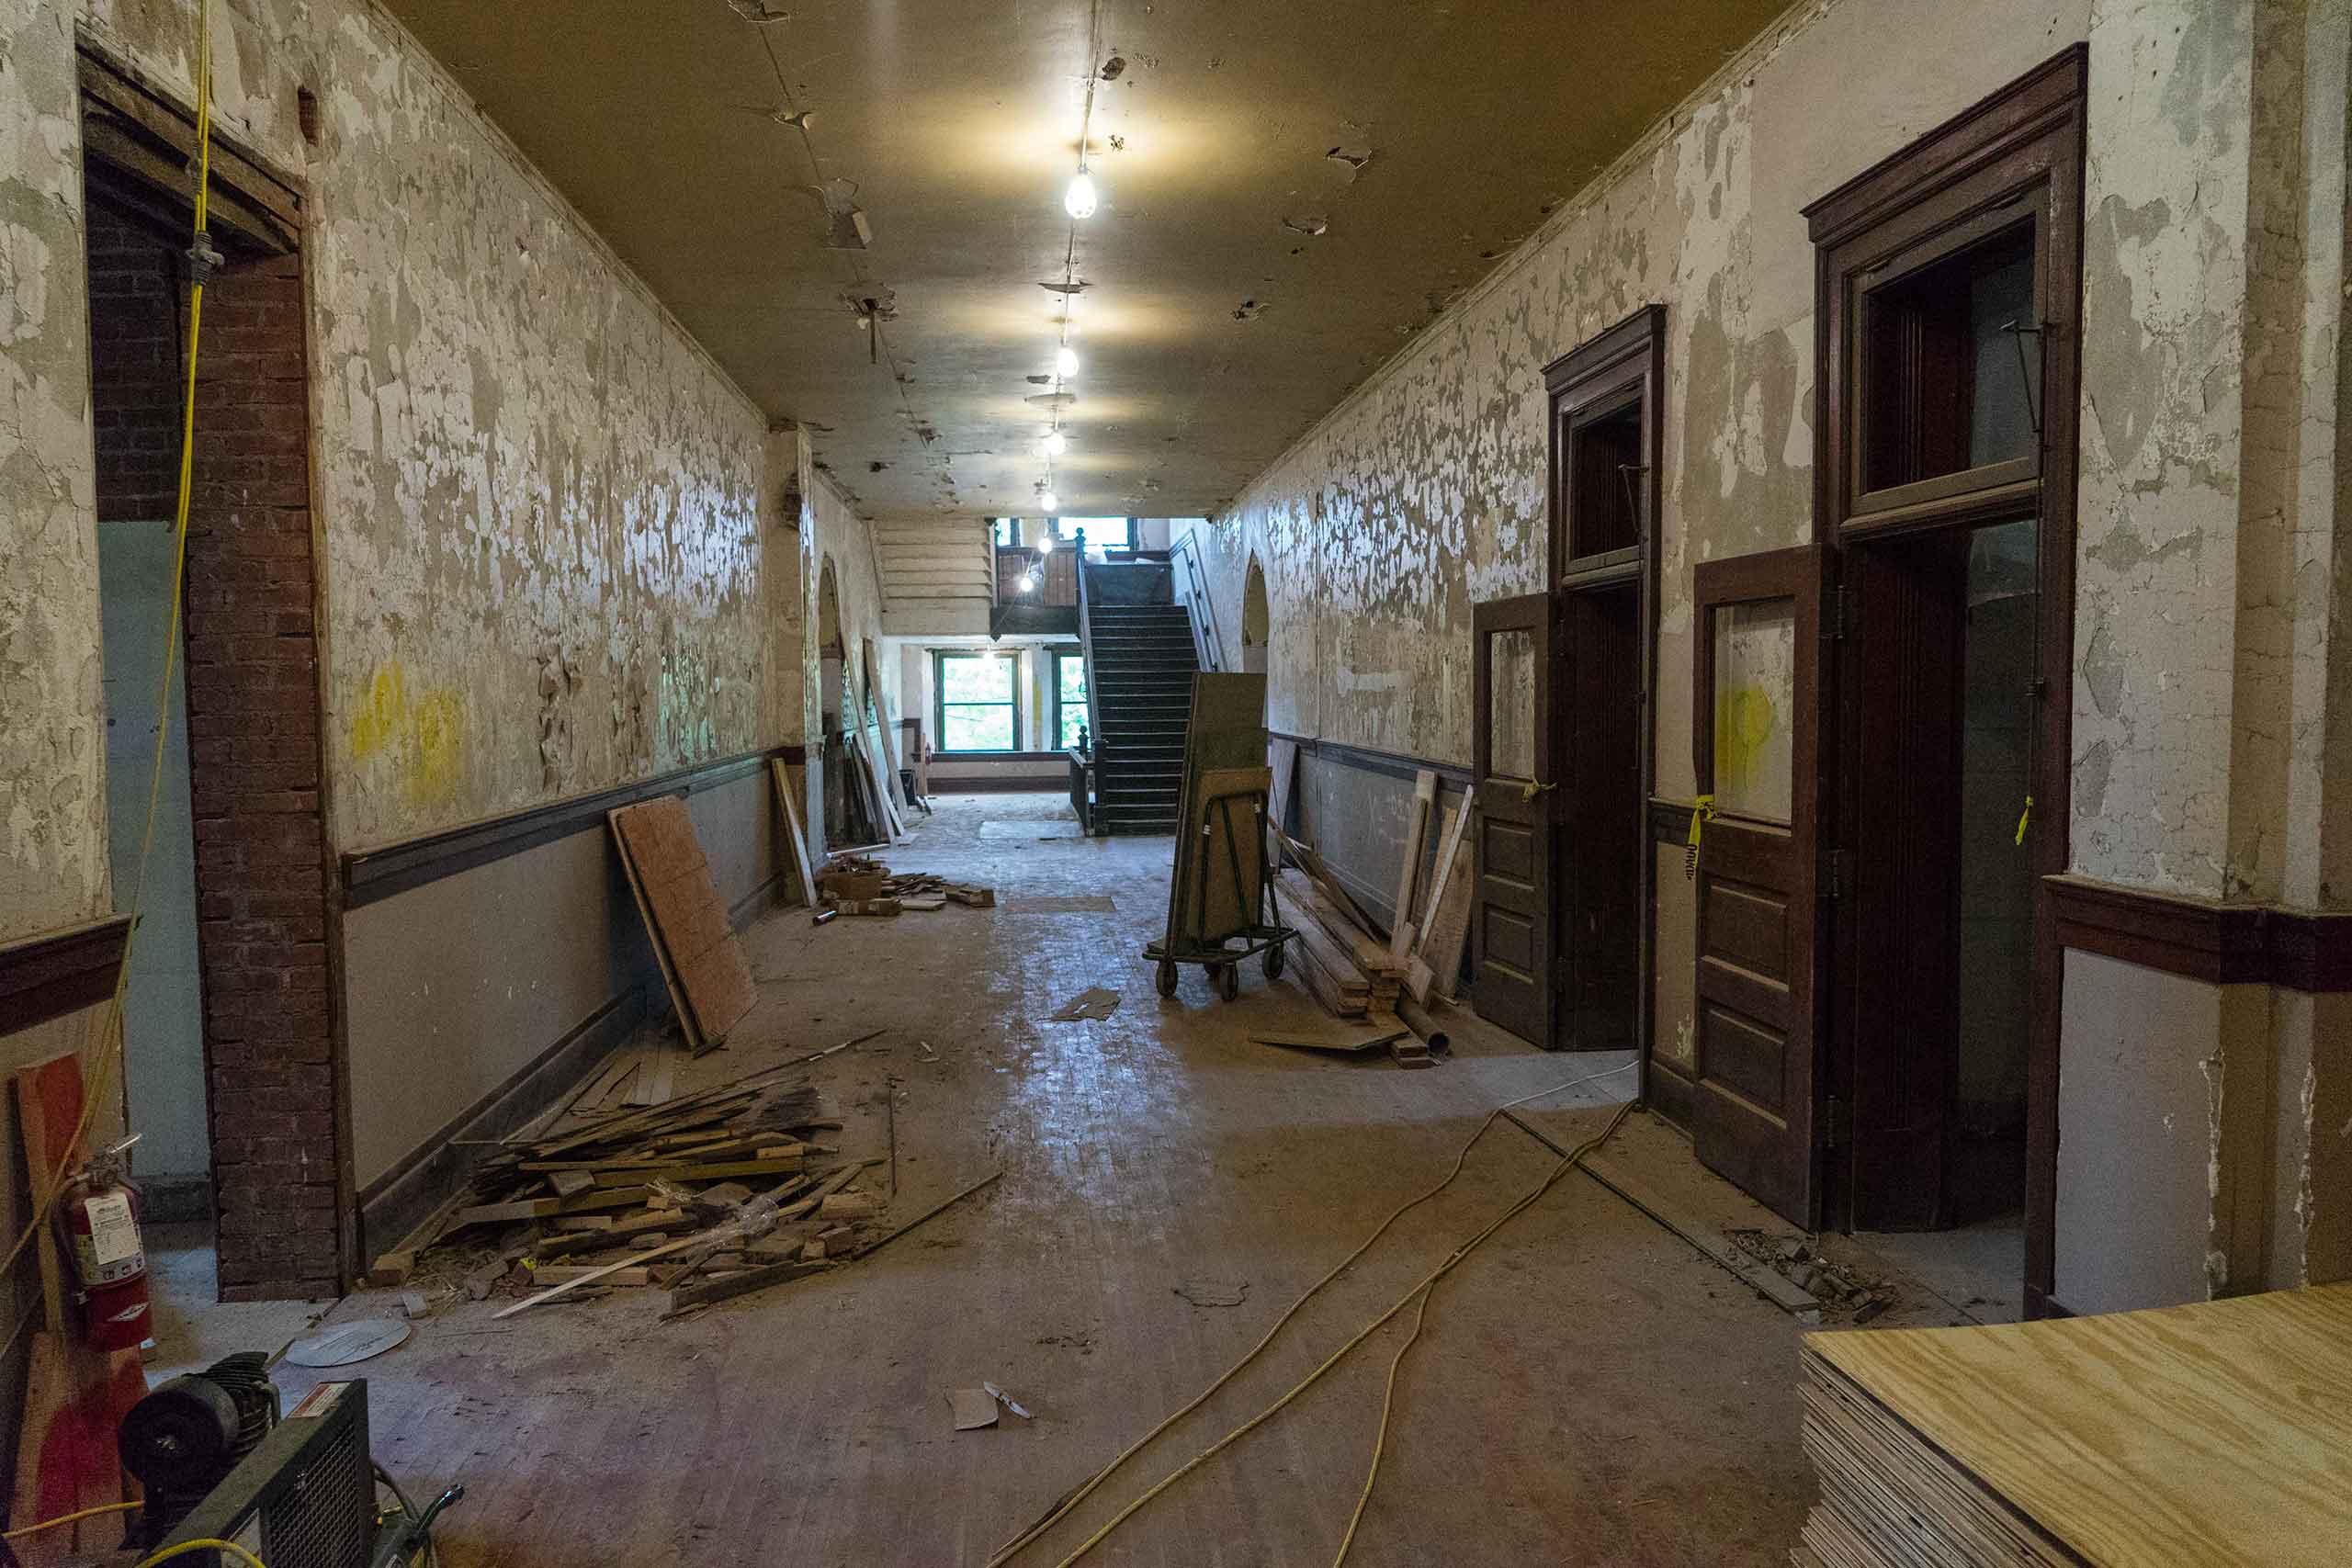 Norman-School-Lofts-Hallway-Before